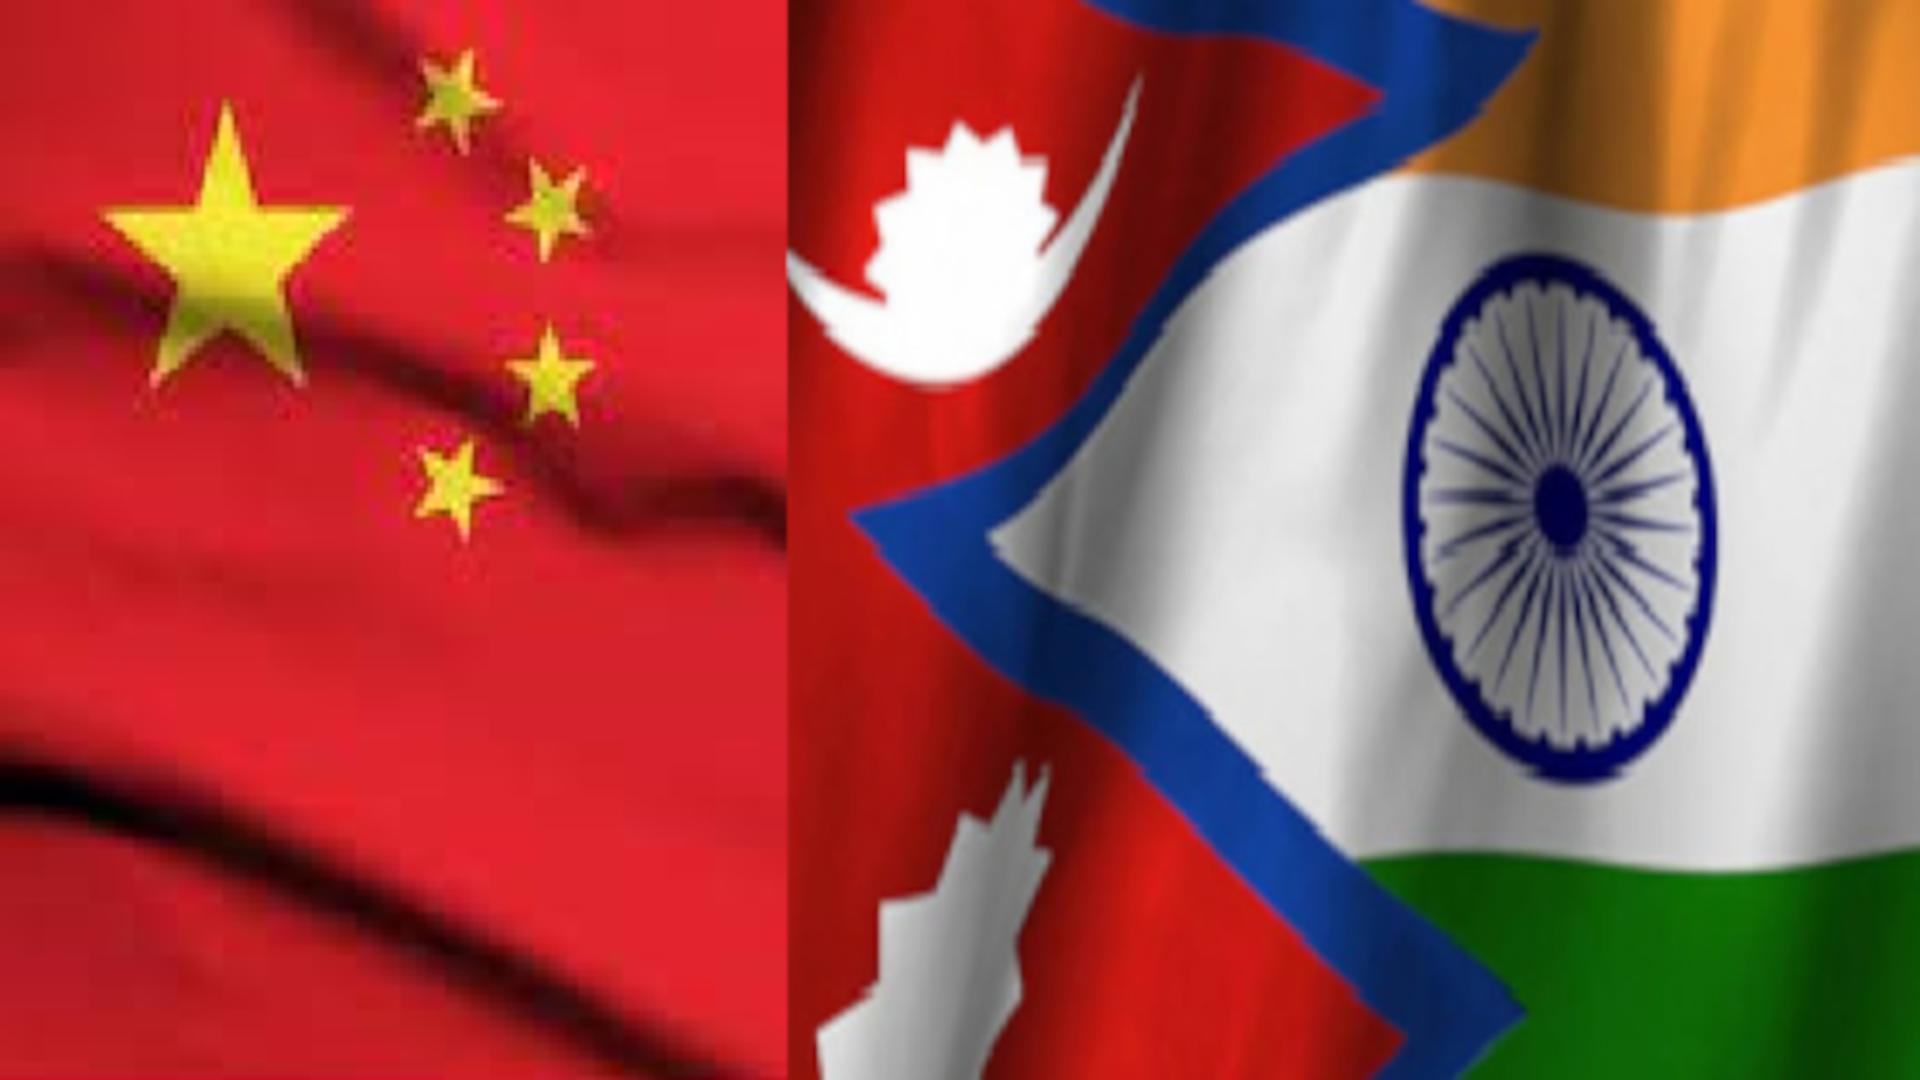 Y1utu-nepal-india-china1.png